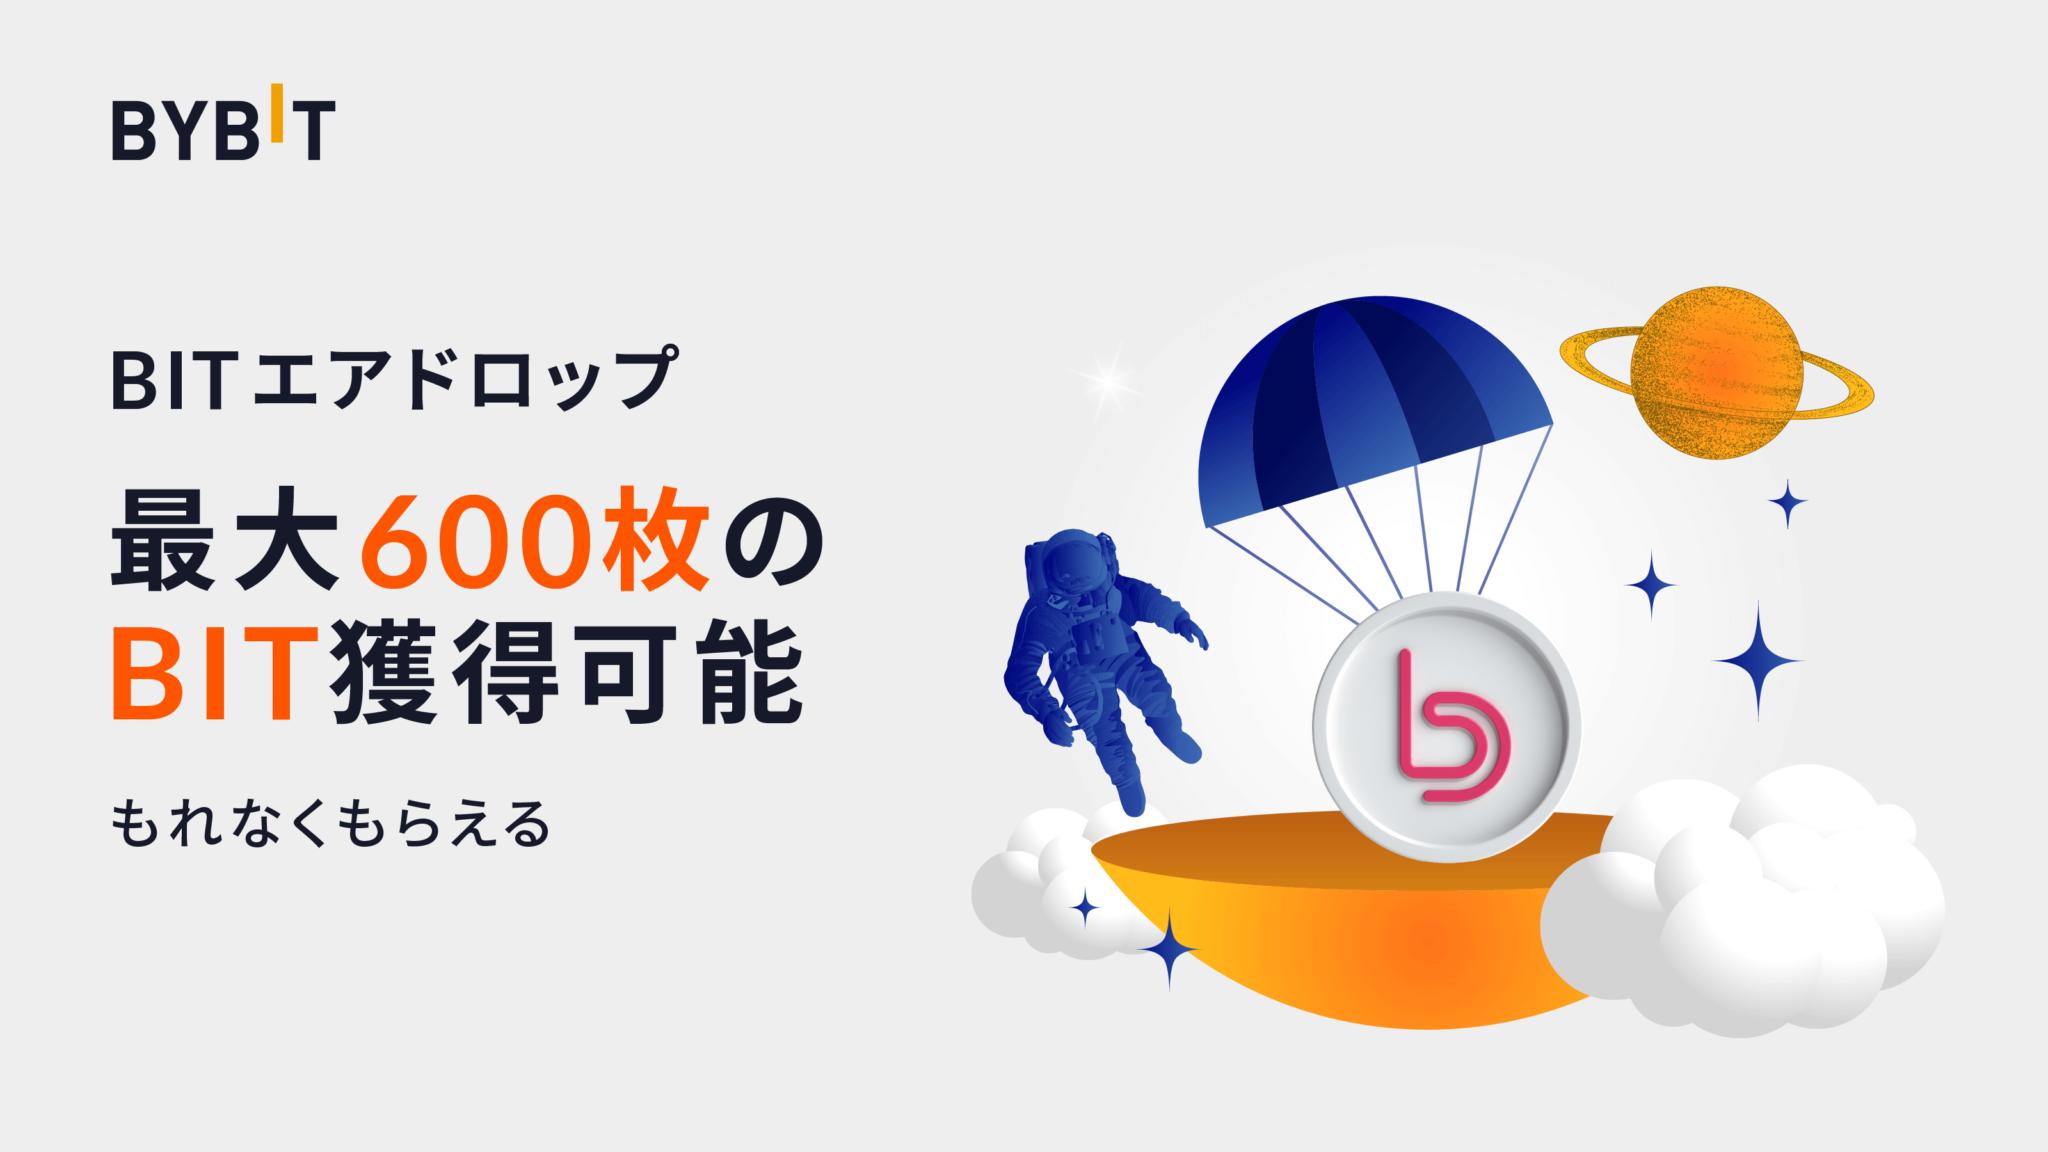 BitDAO エアドロップで最大600枚を獲得できる